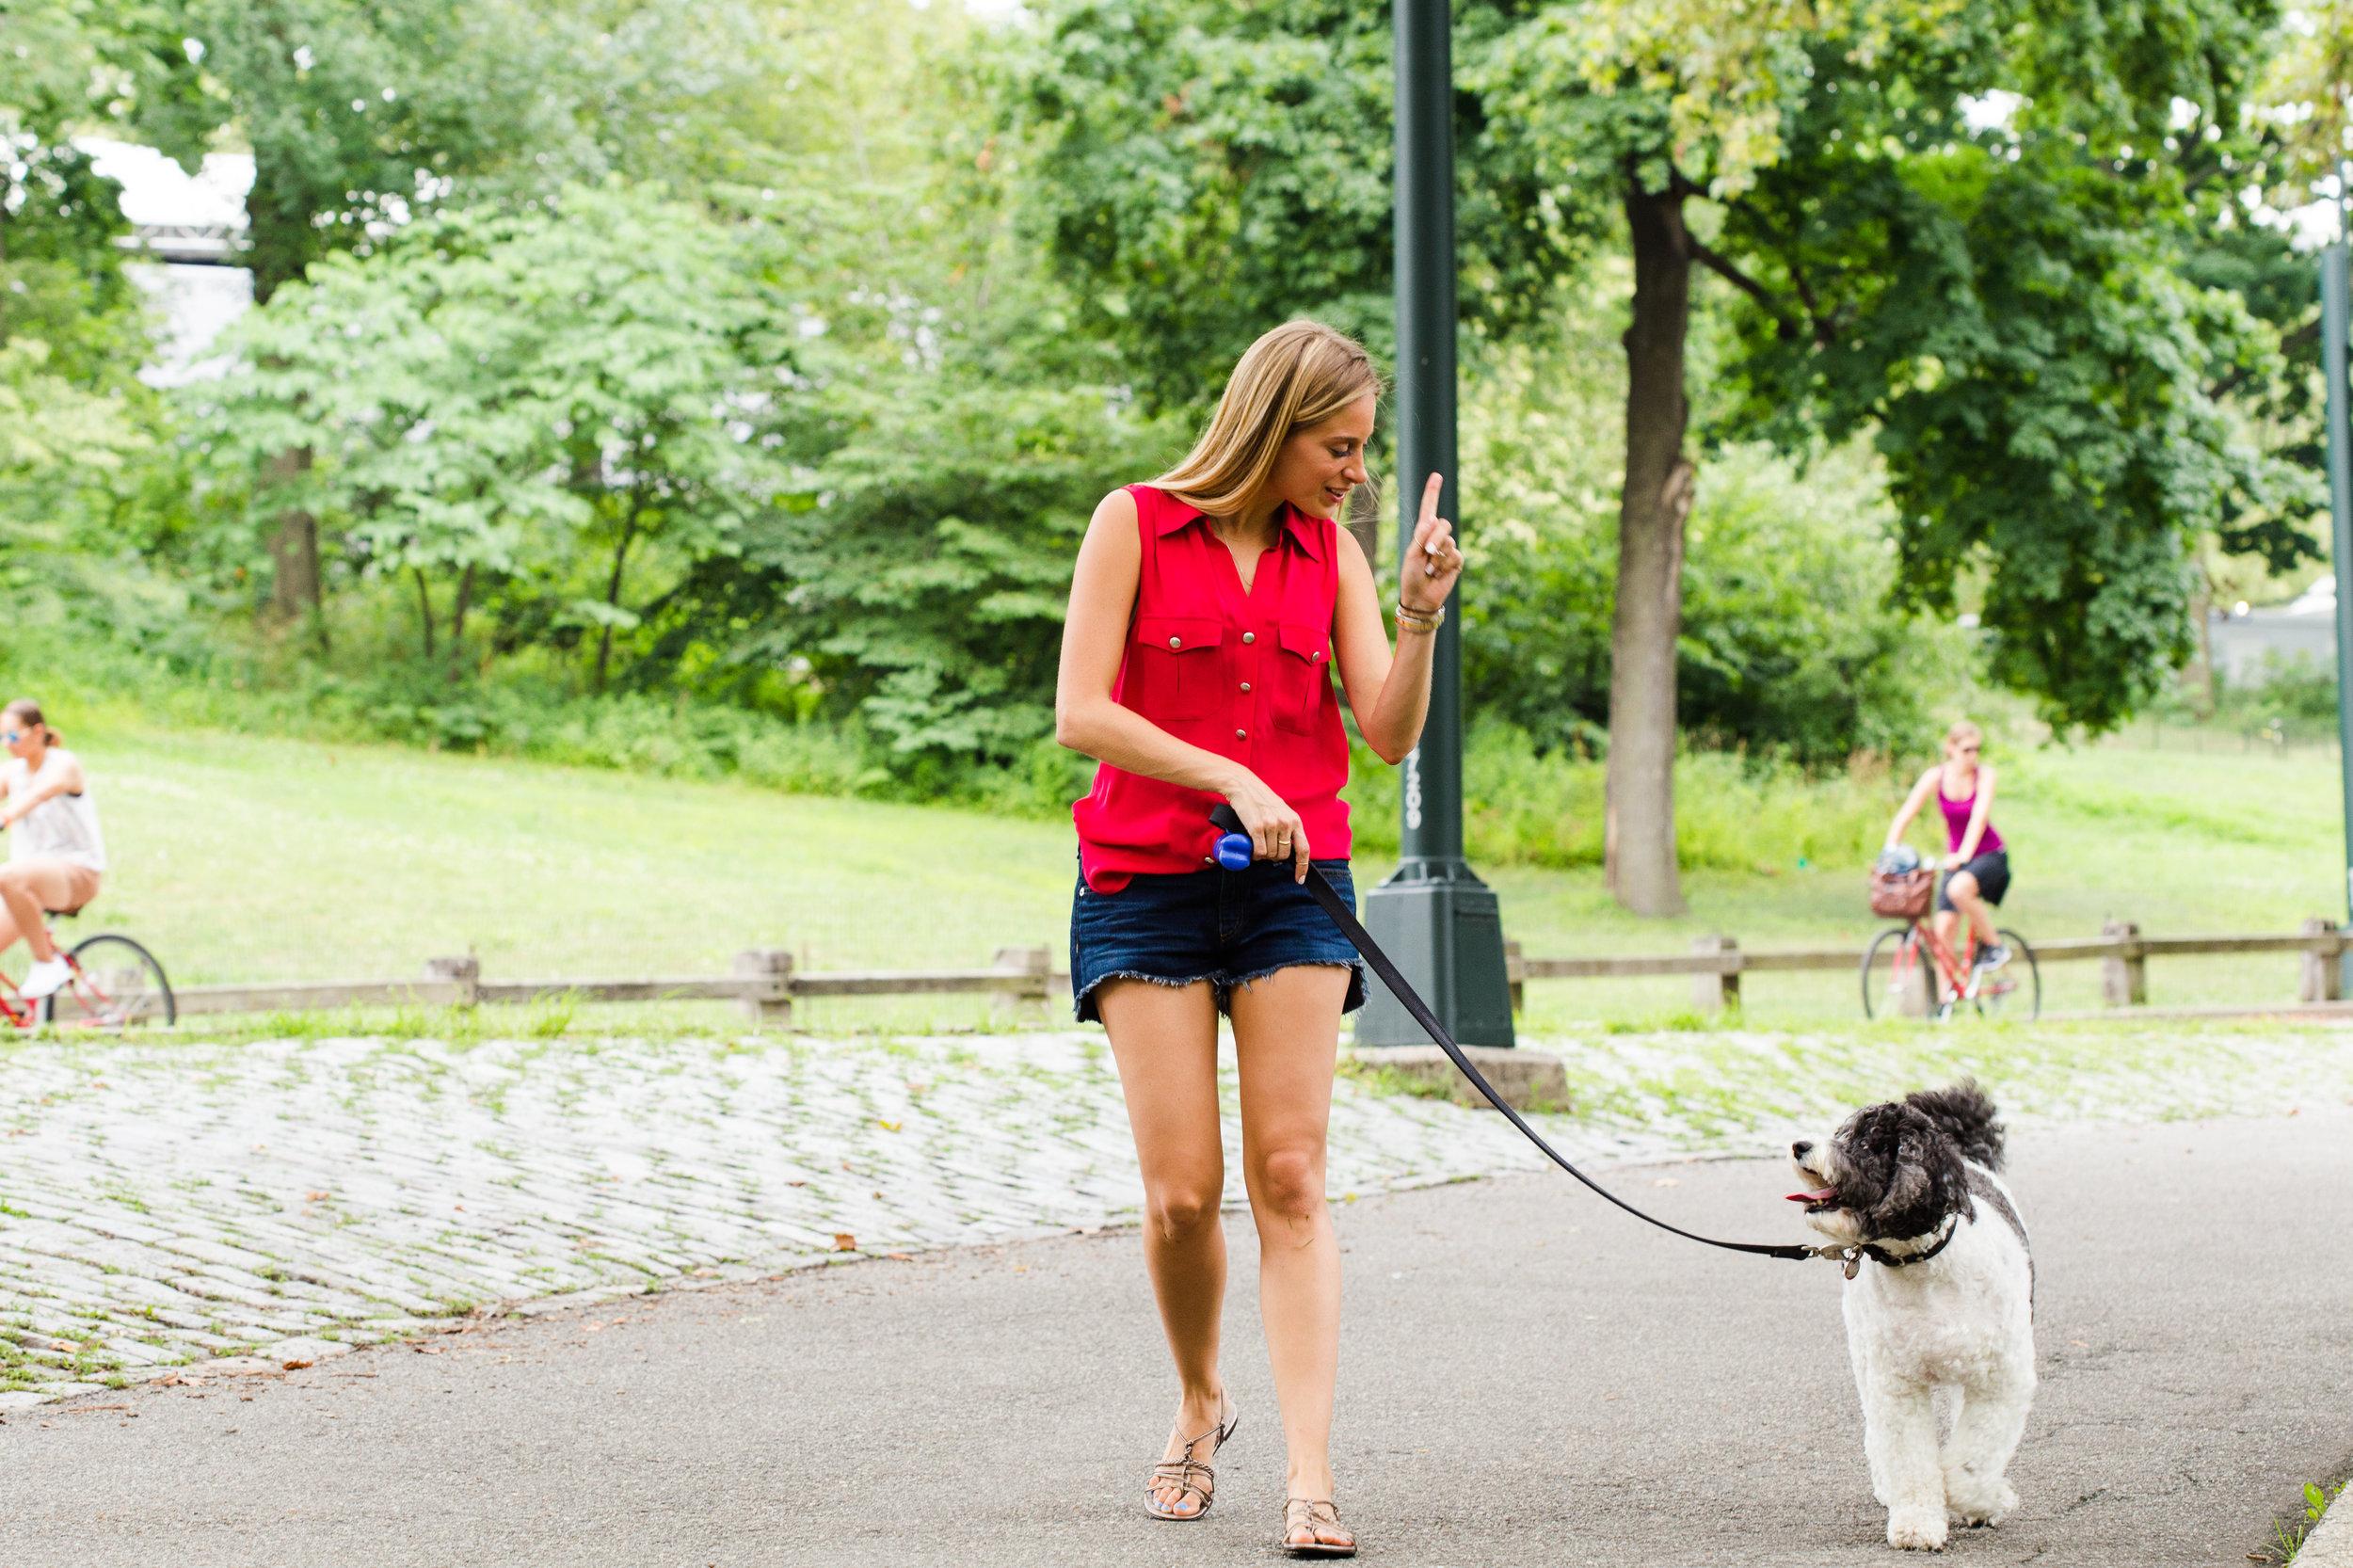 Shelby Semel New York City Dog Training :: Shelby Semel, Senior Trainer & Founder